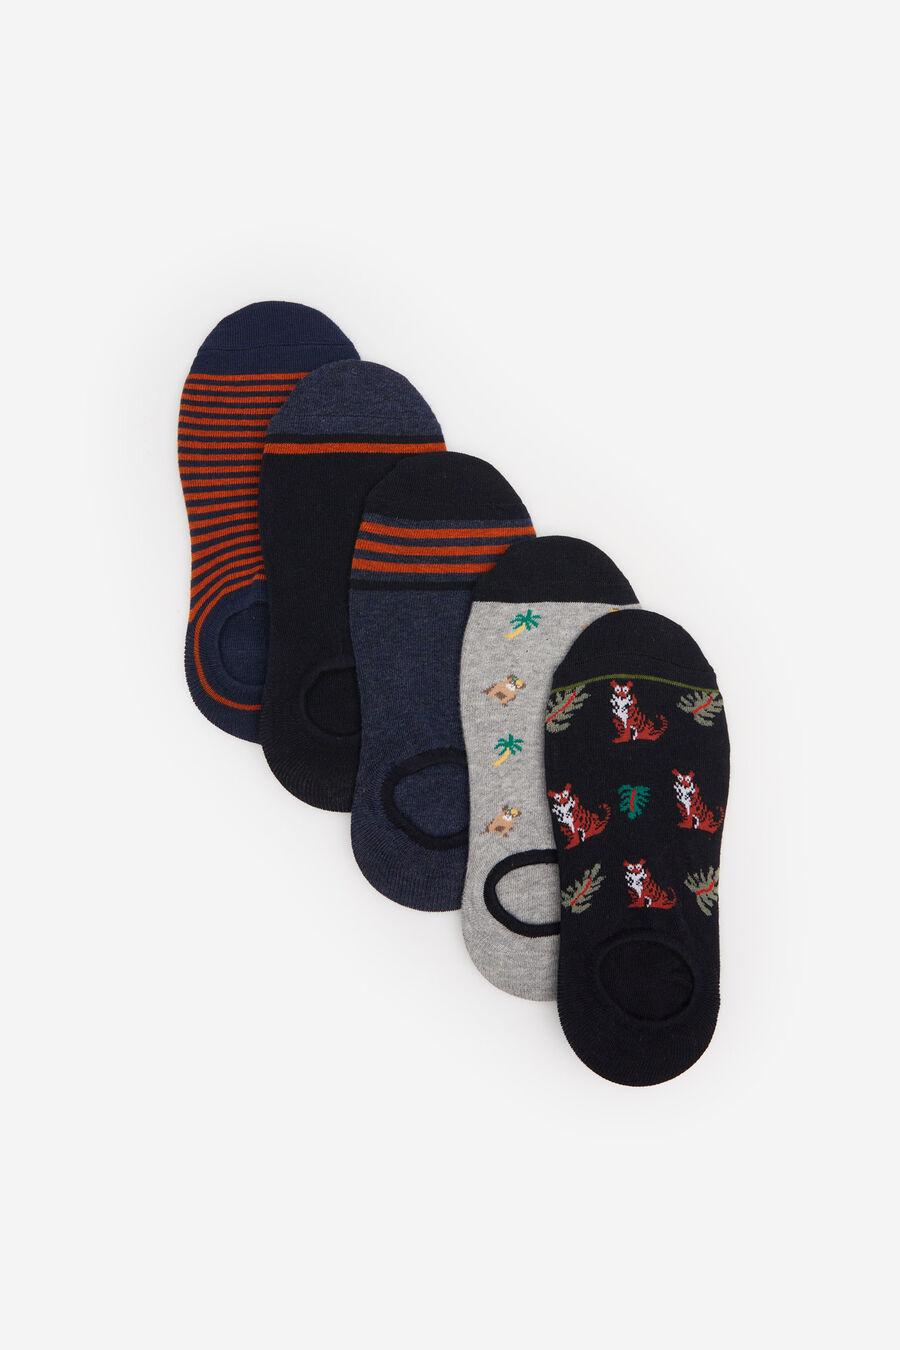 Lot 5 chaussettes invisibles